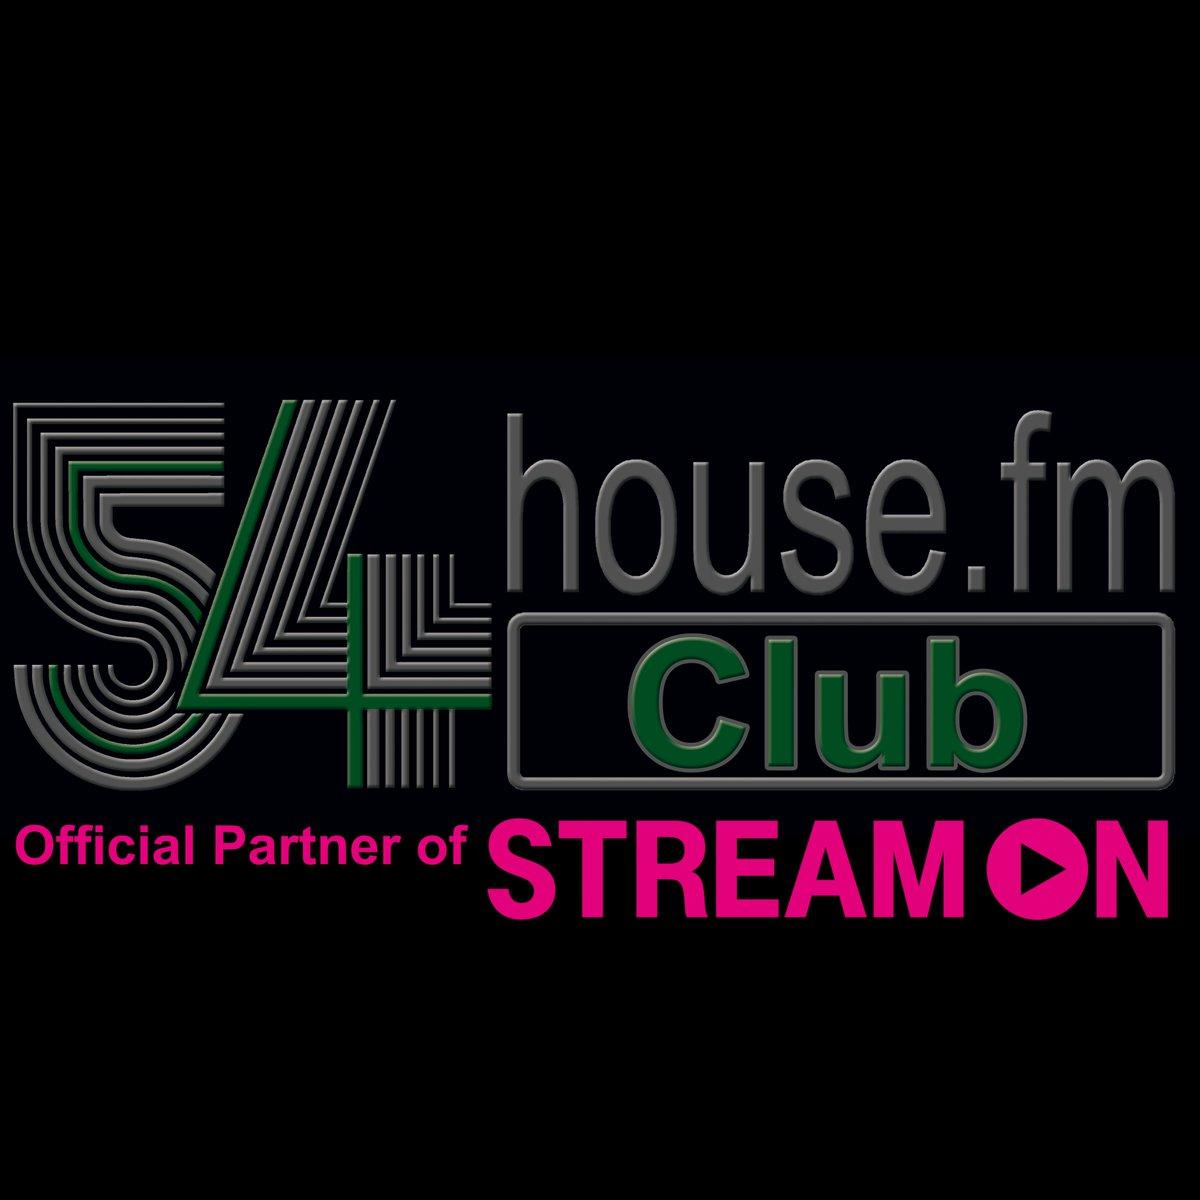 54house.fm's photo on #S04KRC